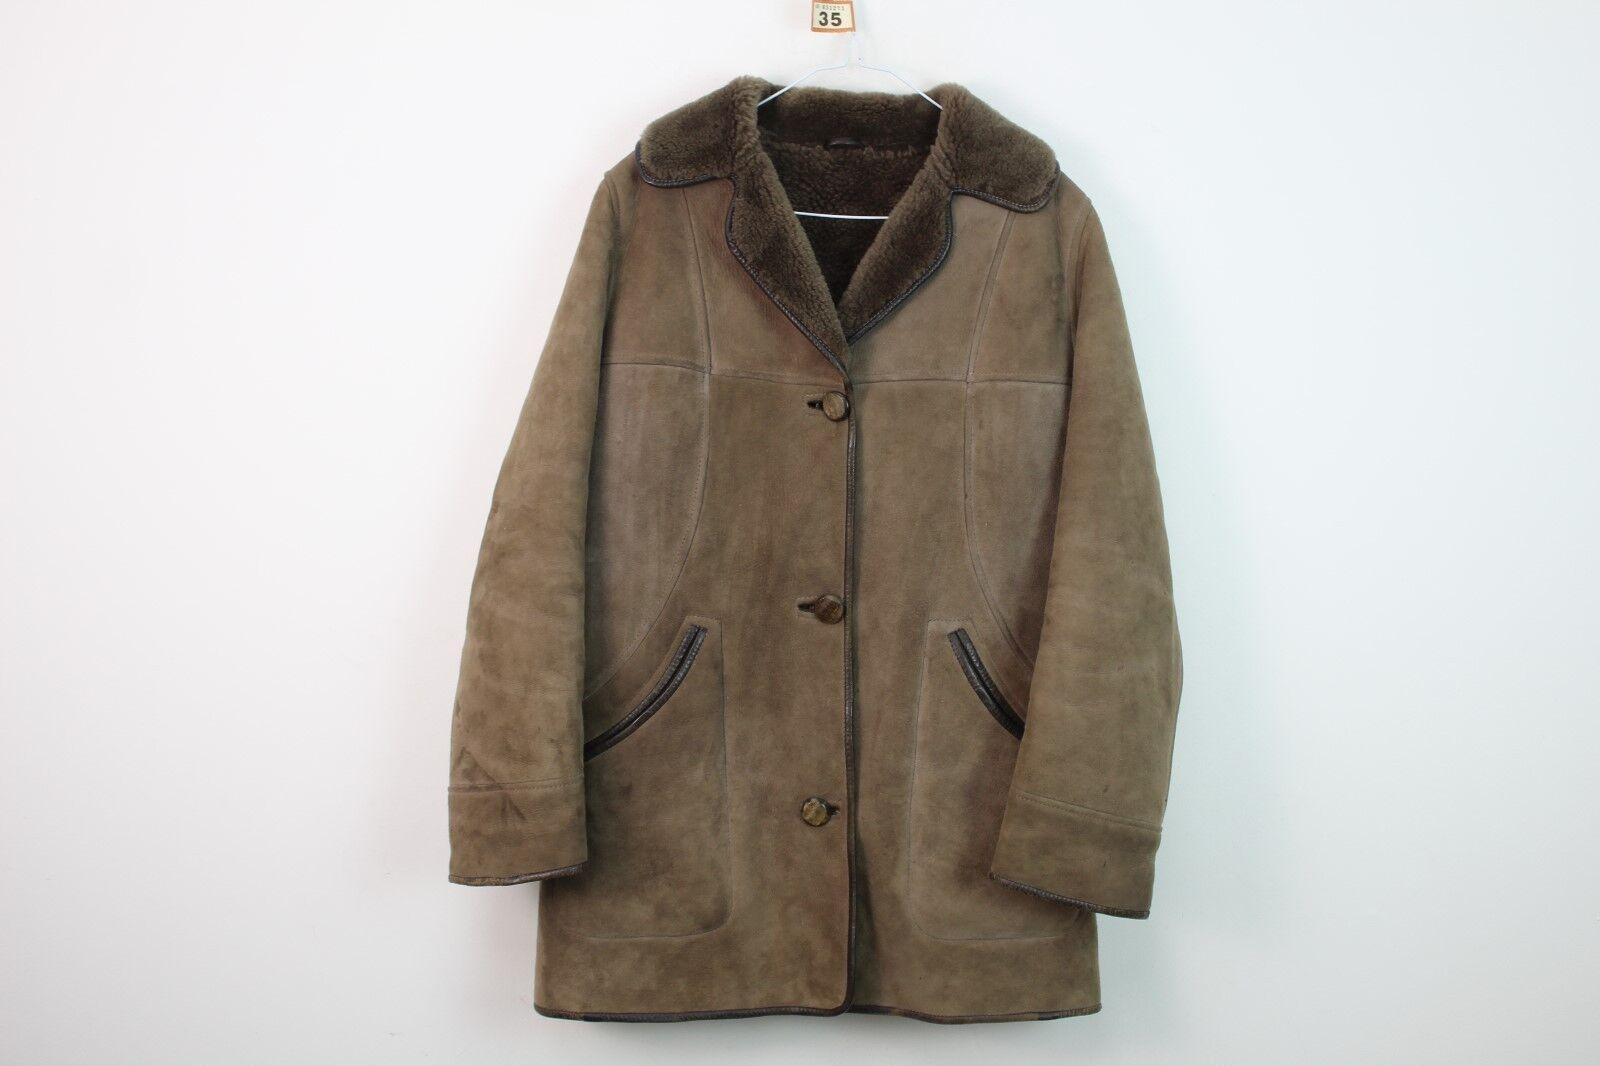 Womens S.Sanders & Sons Brown Sheepskin Coat size 32 No.R35 17 9